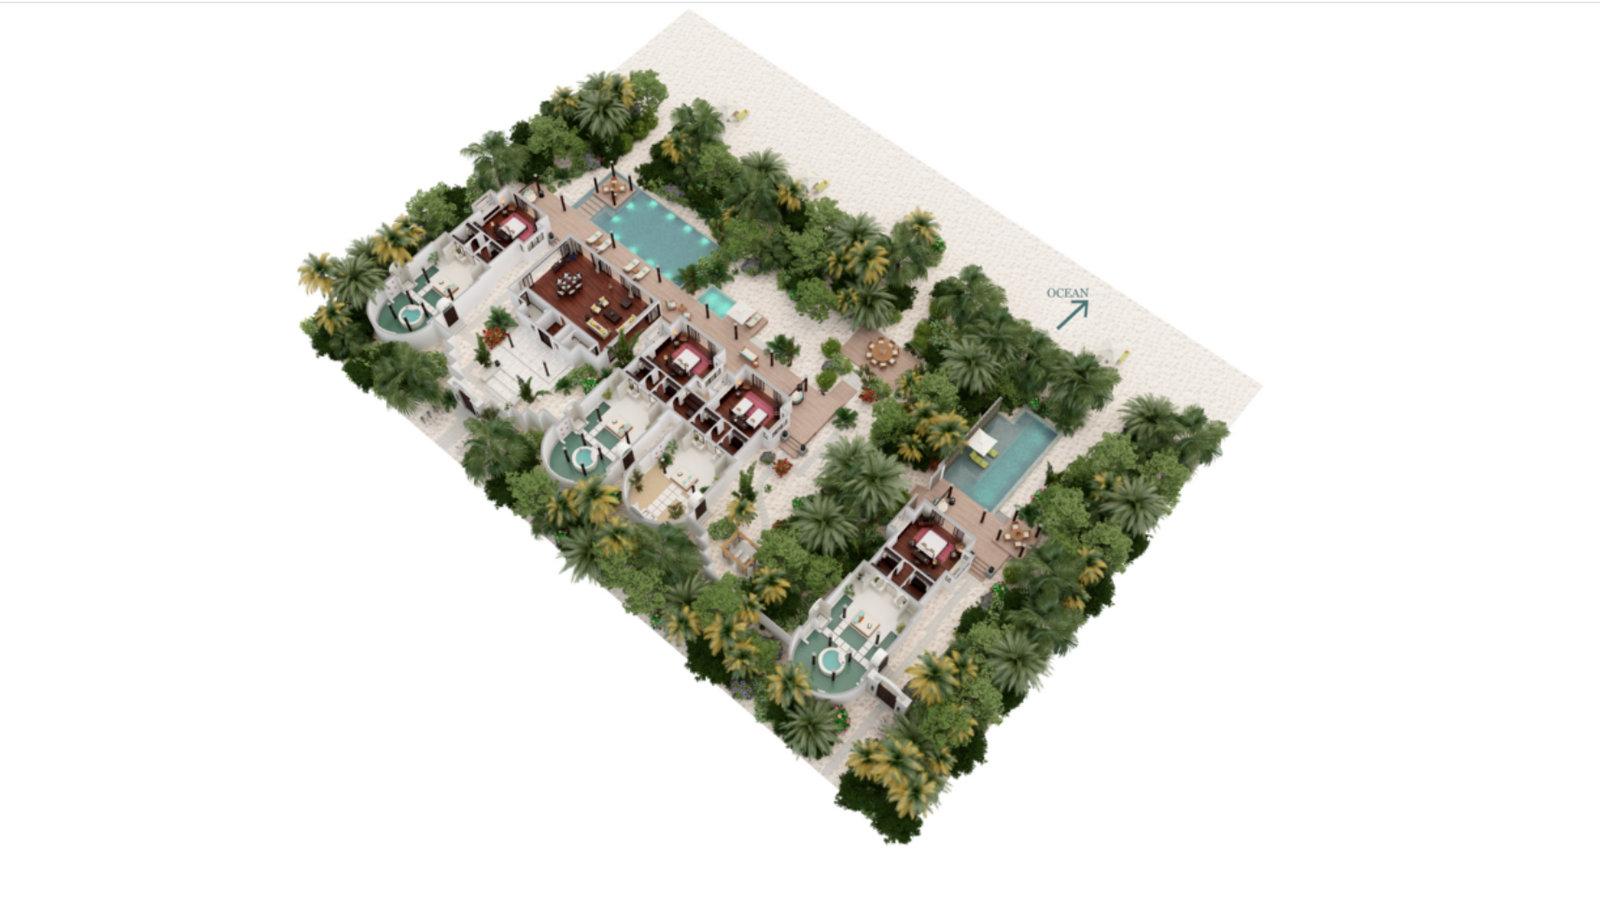 Мальдивы, отель Anantara Kihavah Maldives Villas, план-схема номера Four-Bedroom Beach Pool Residence